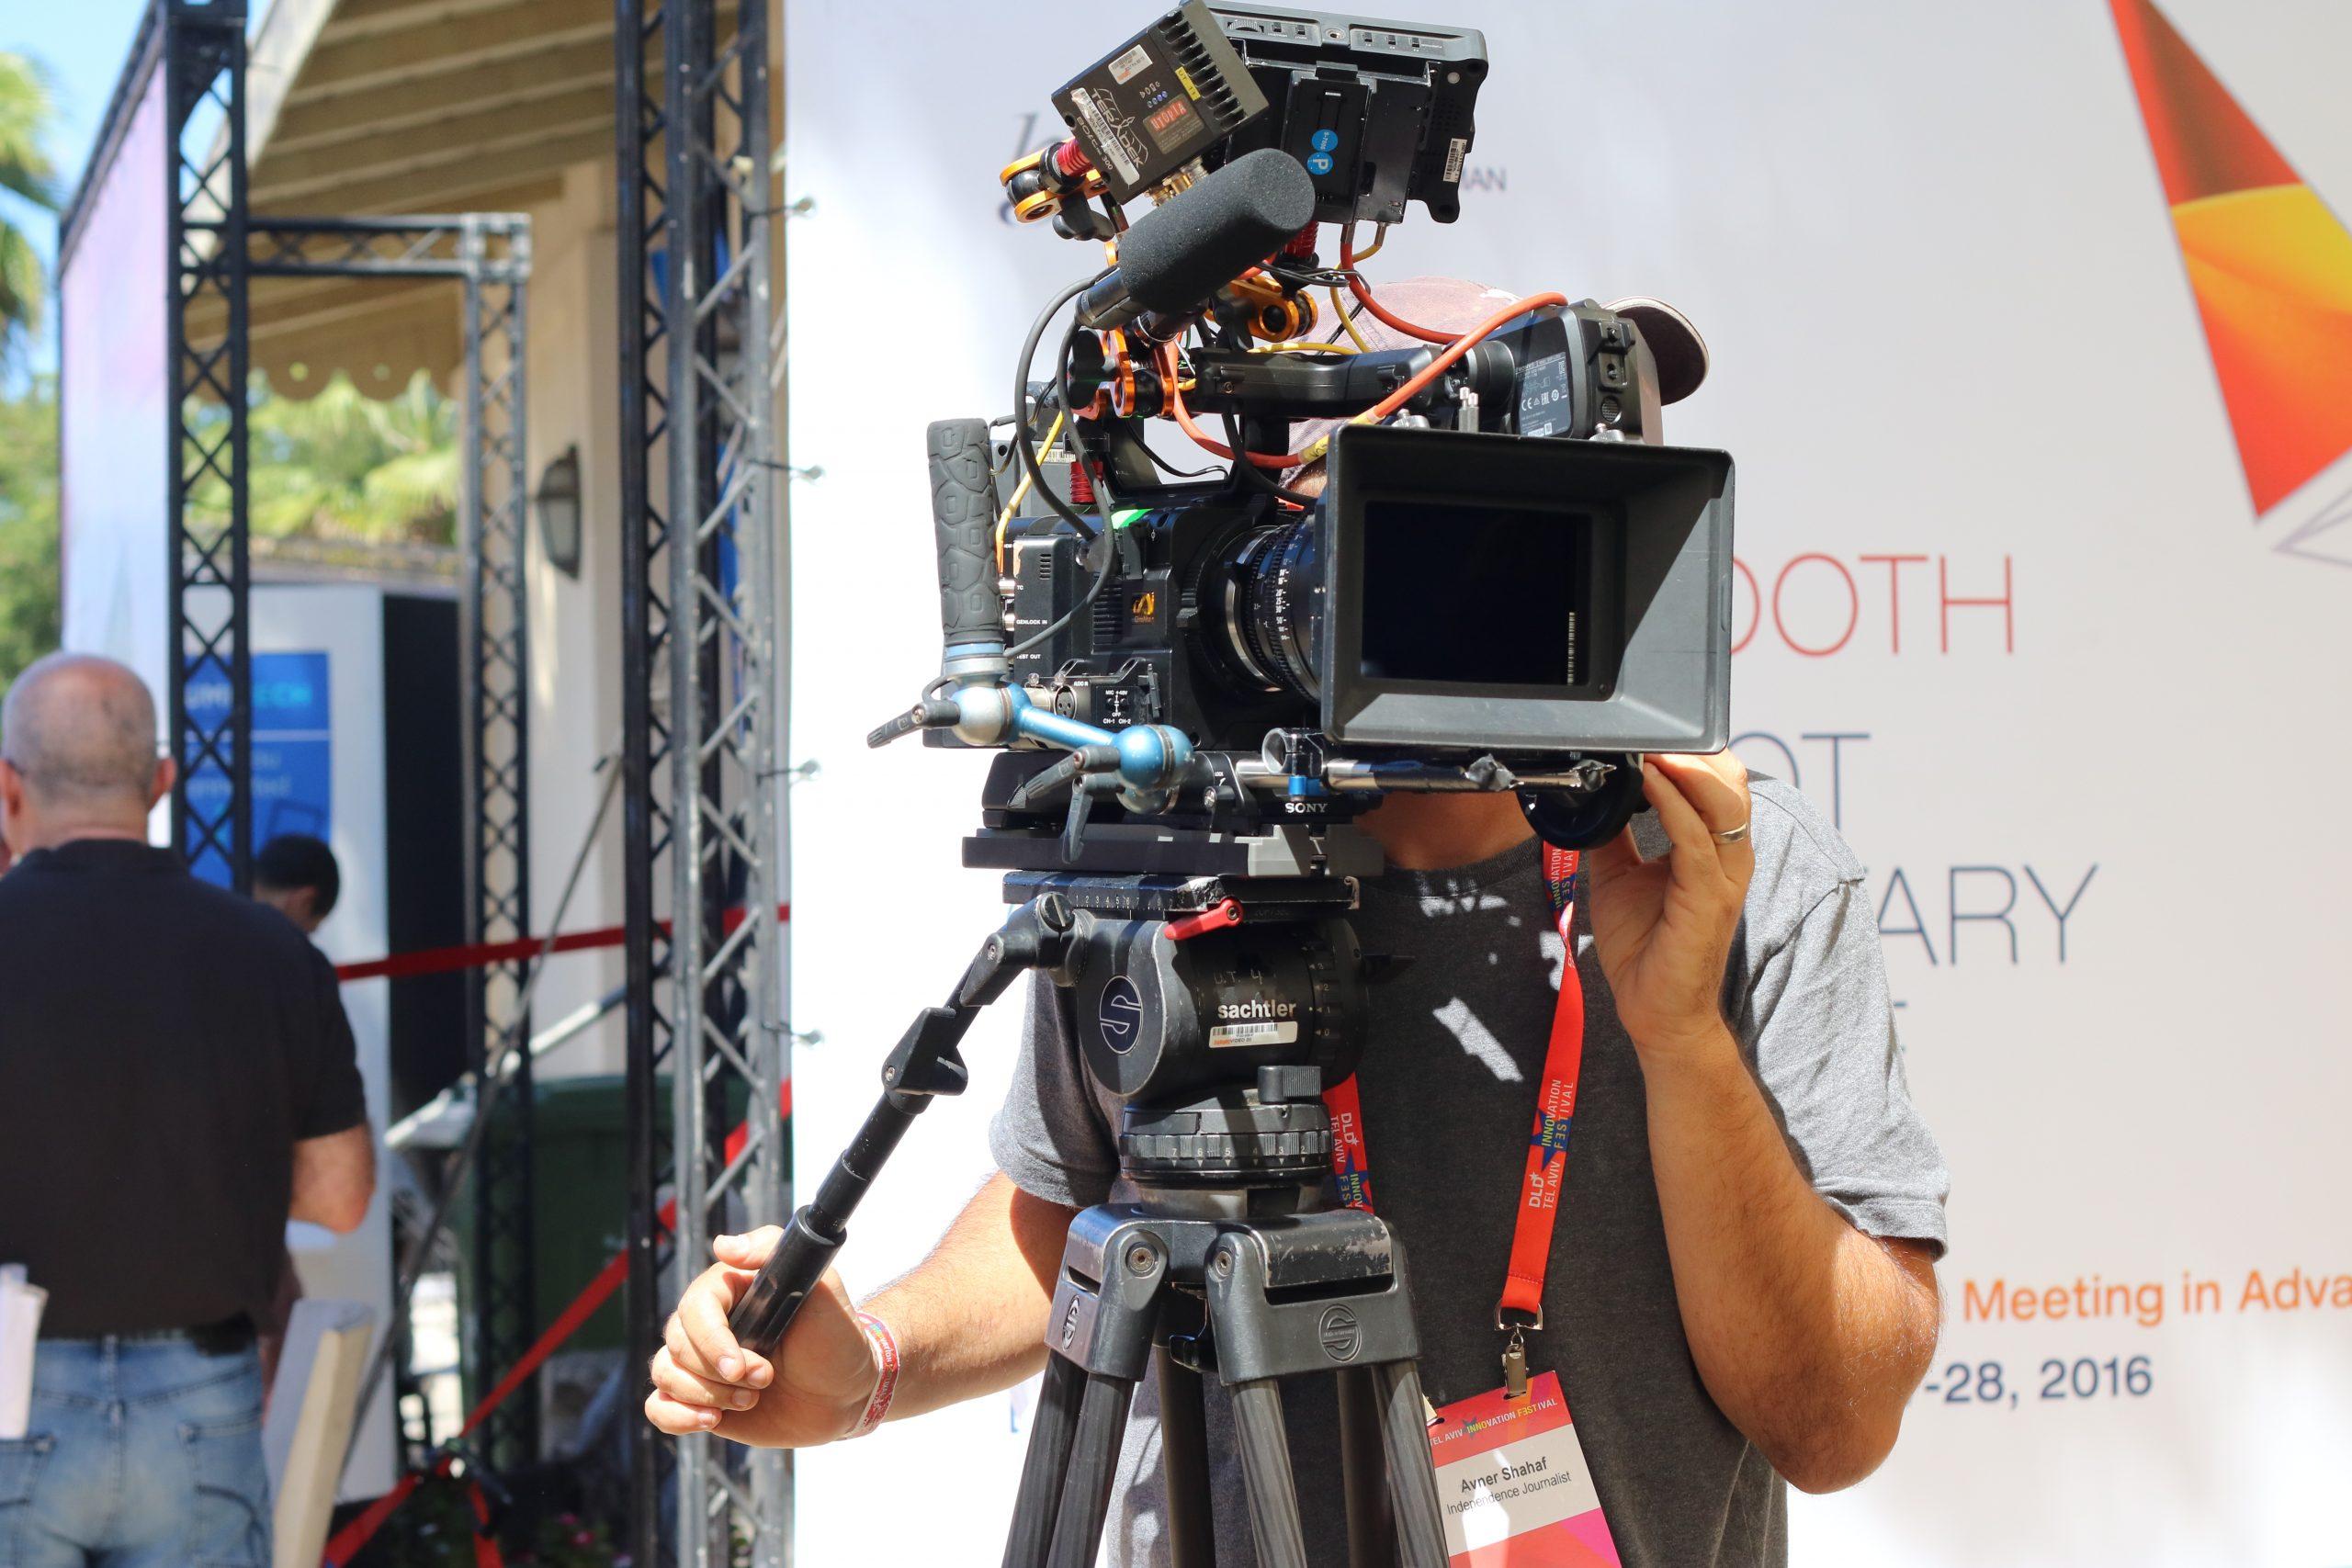 Media Webcasting